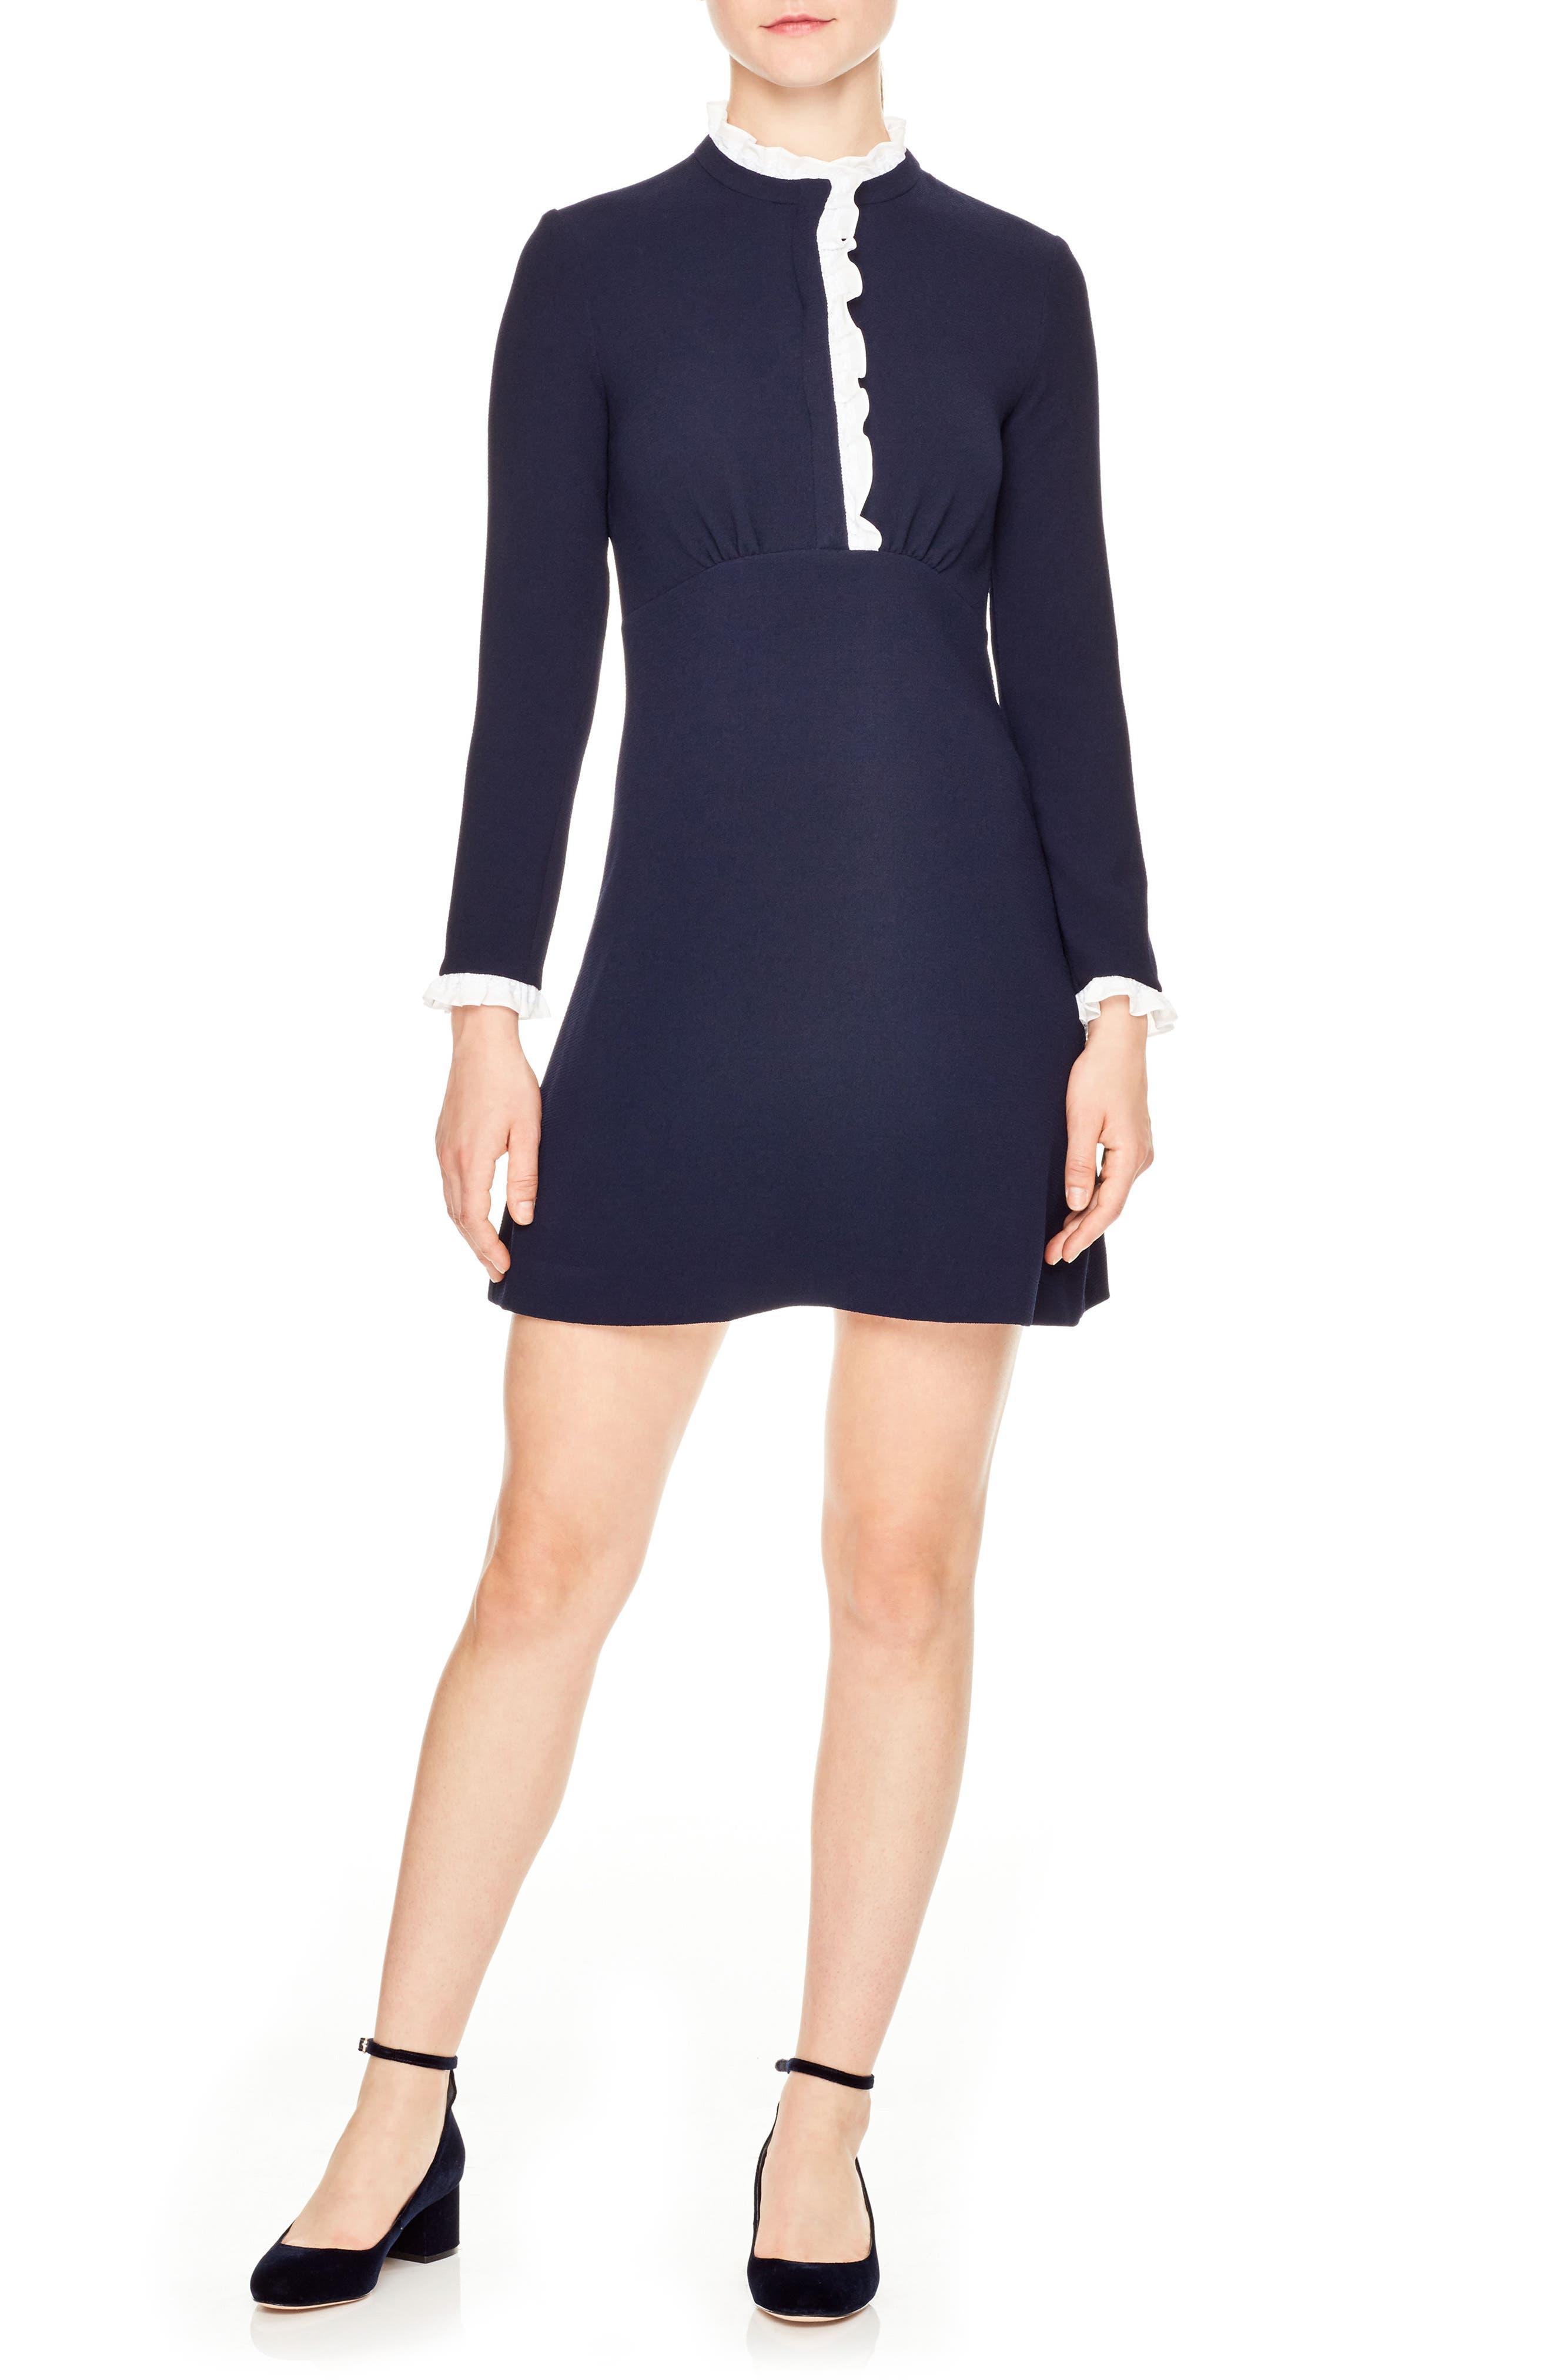 Natalia Long Sleeve Dress,                         Main,                         color, Navy